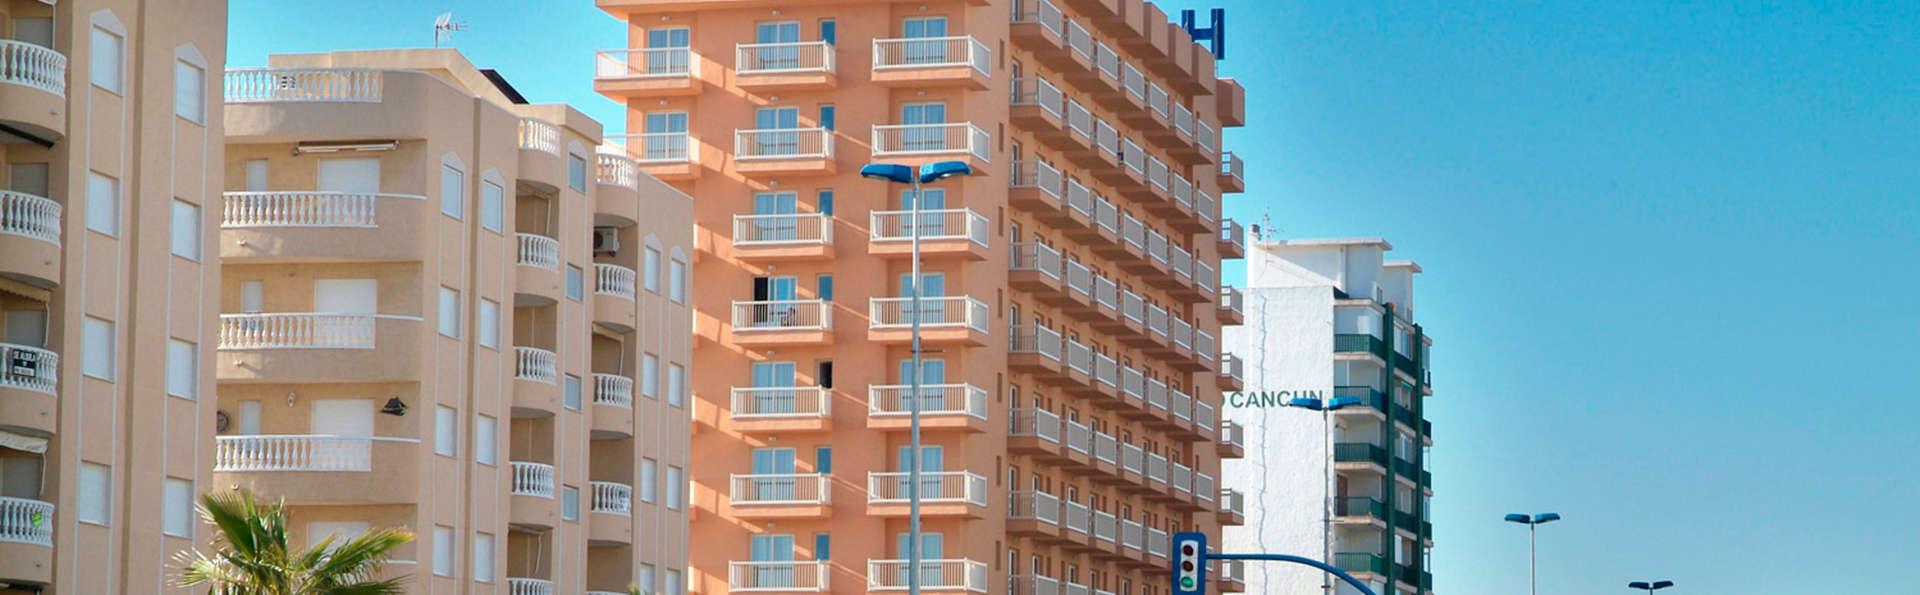 Poseidón La Manga Hotel & Spa (Adults Only) - EDIT_front1.jpg